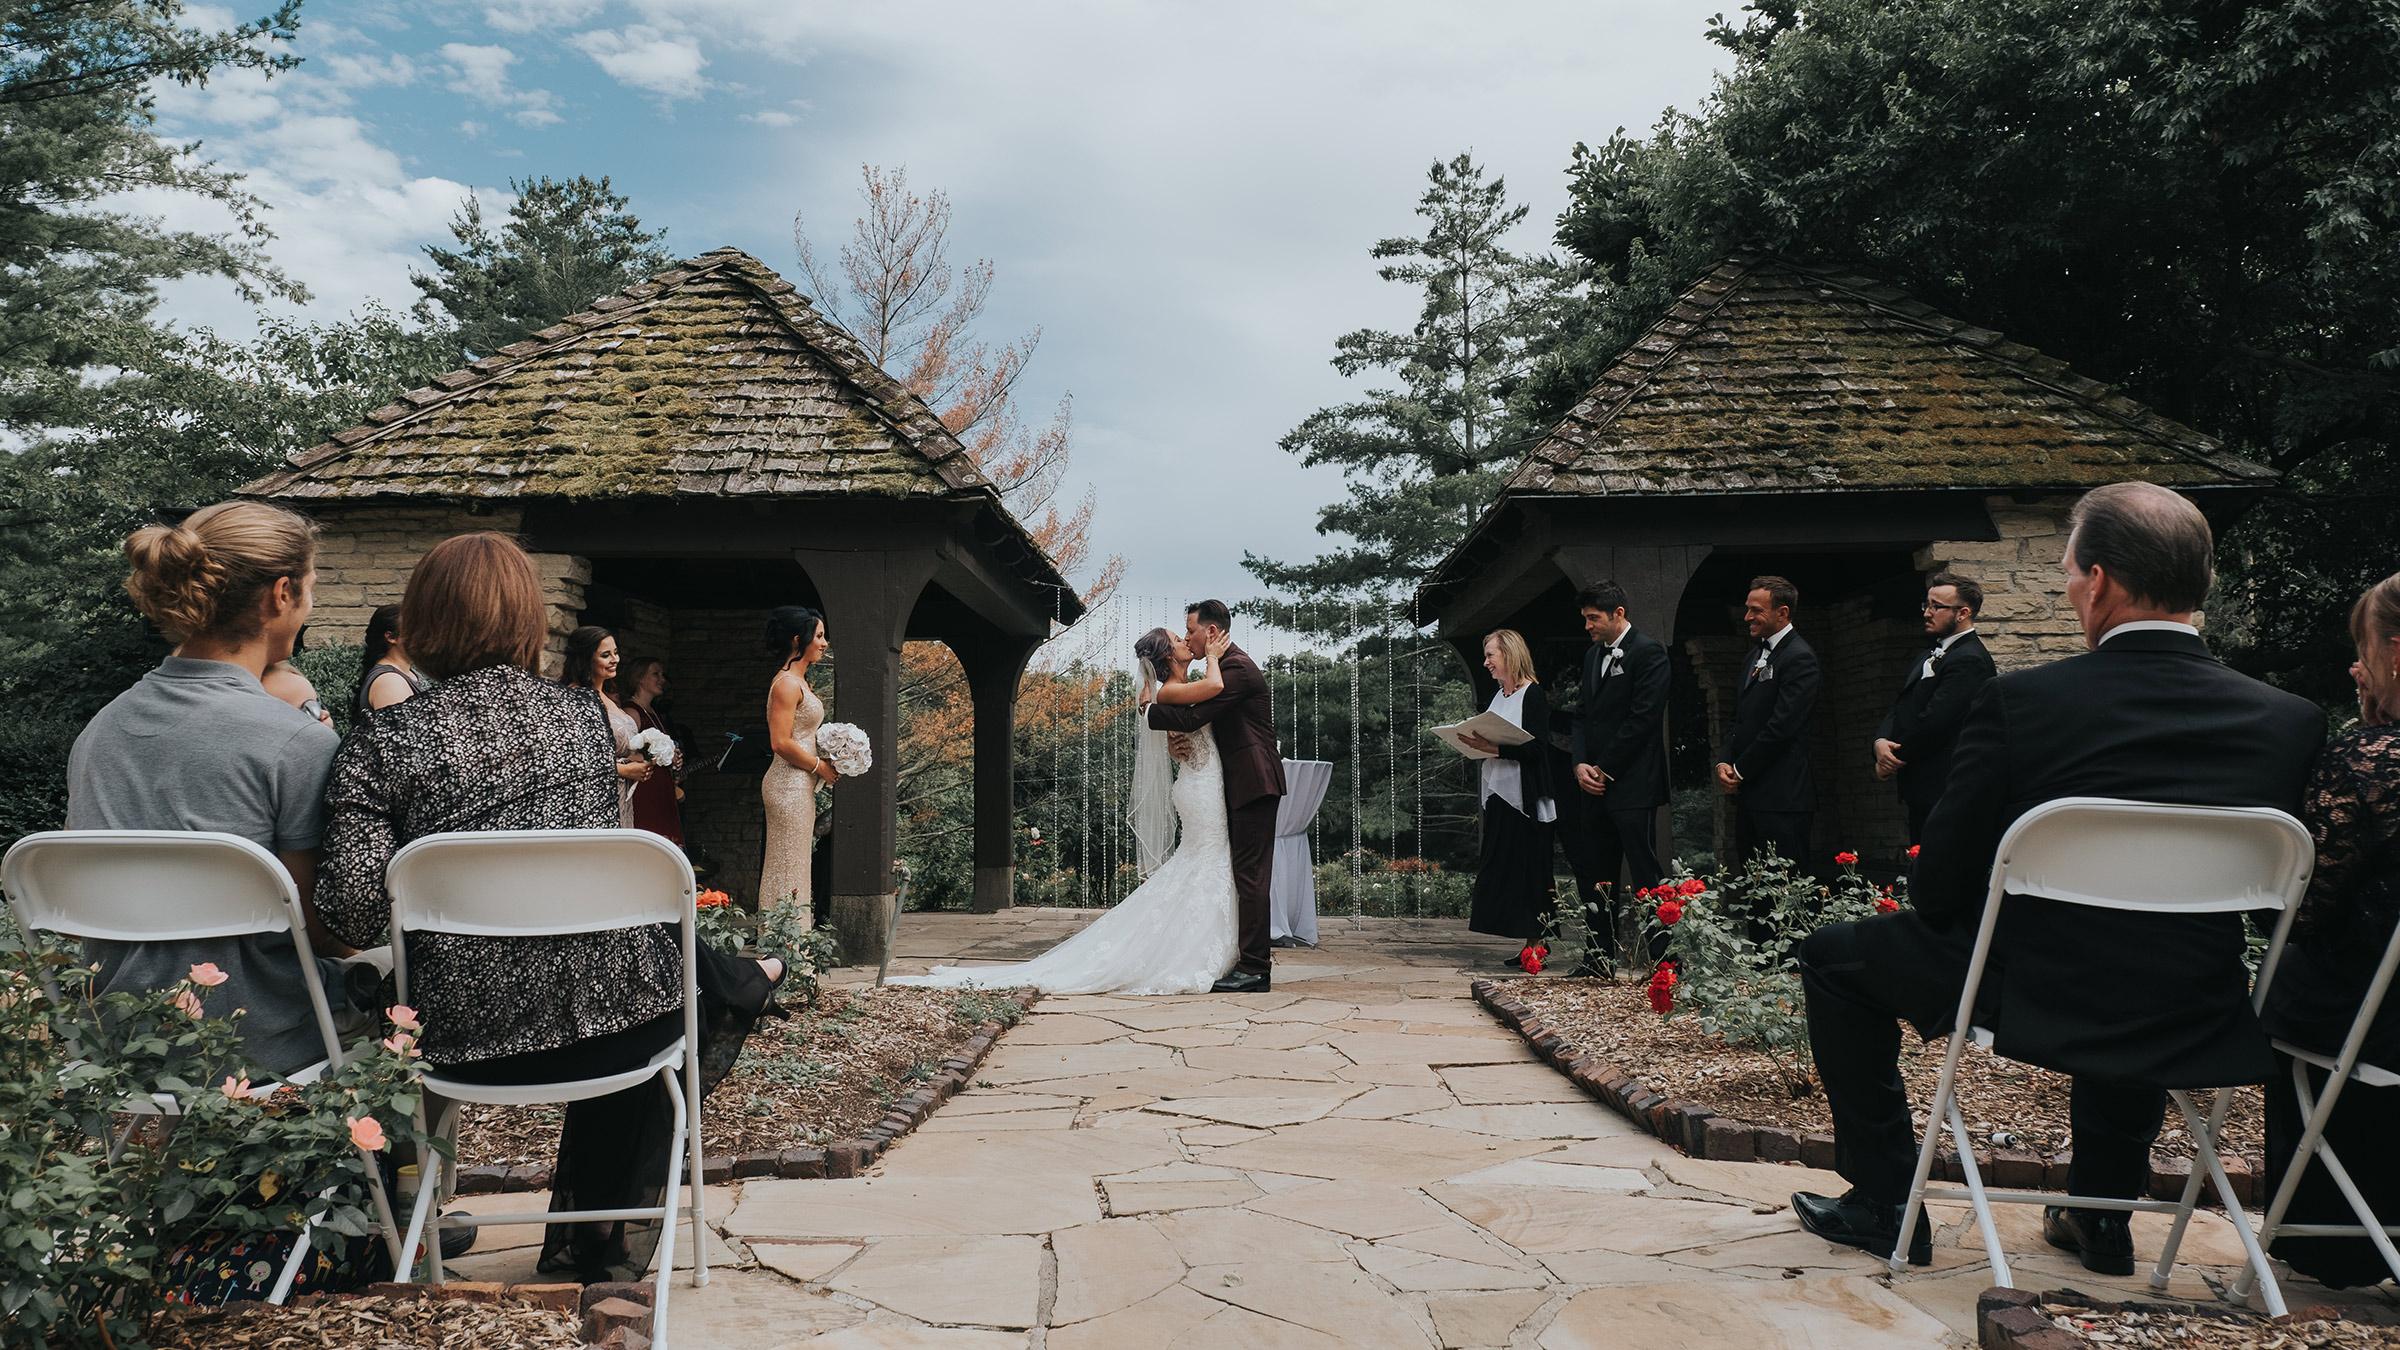 wedding-couple-first-kiss-at-ceremony-desmoines-iowa-rose-garden-raelyn-ramey-photography.jpg